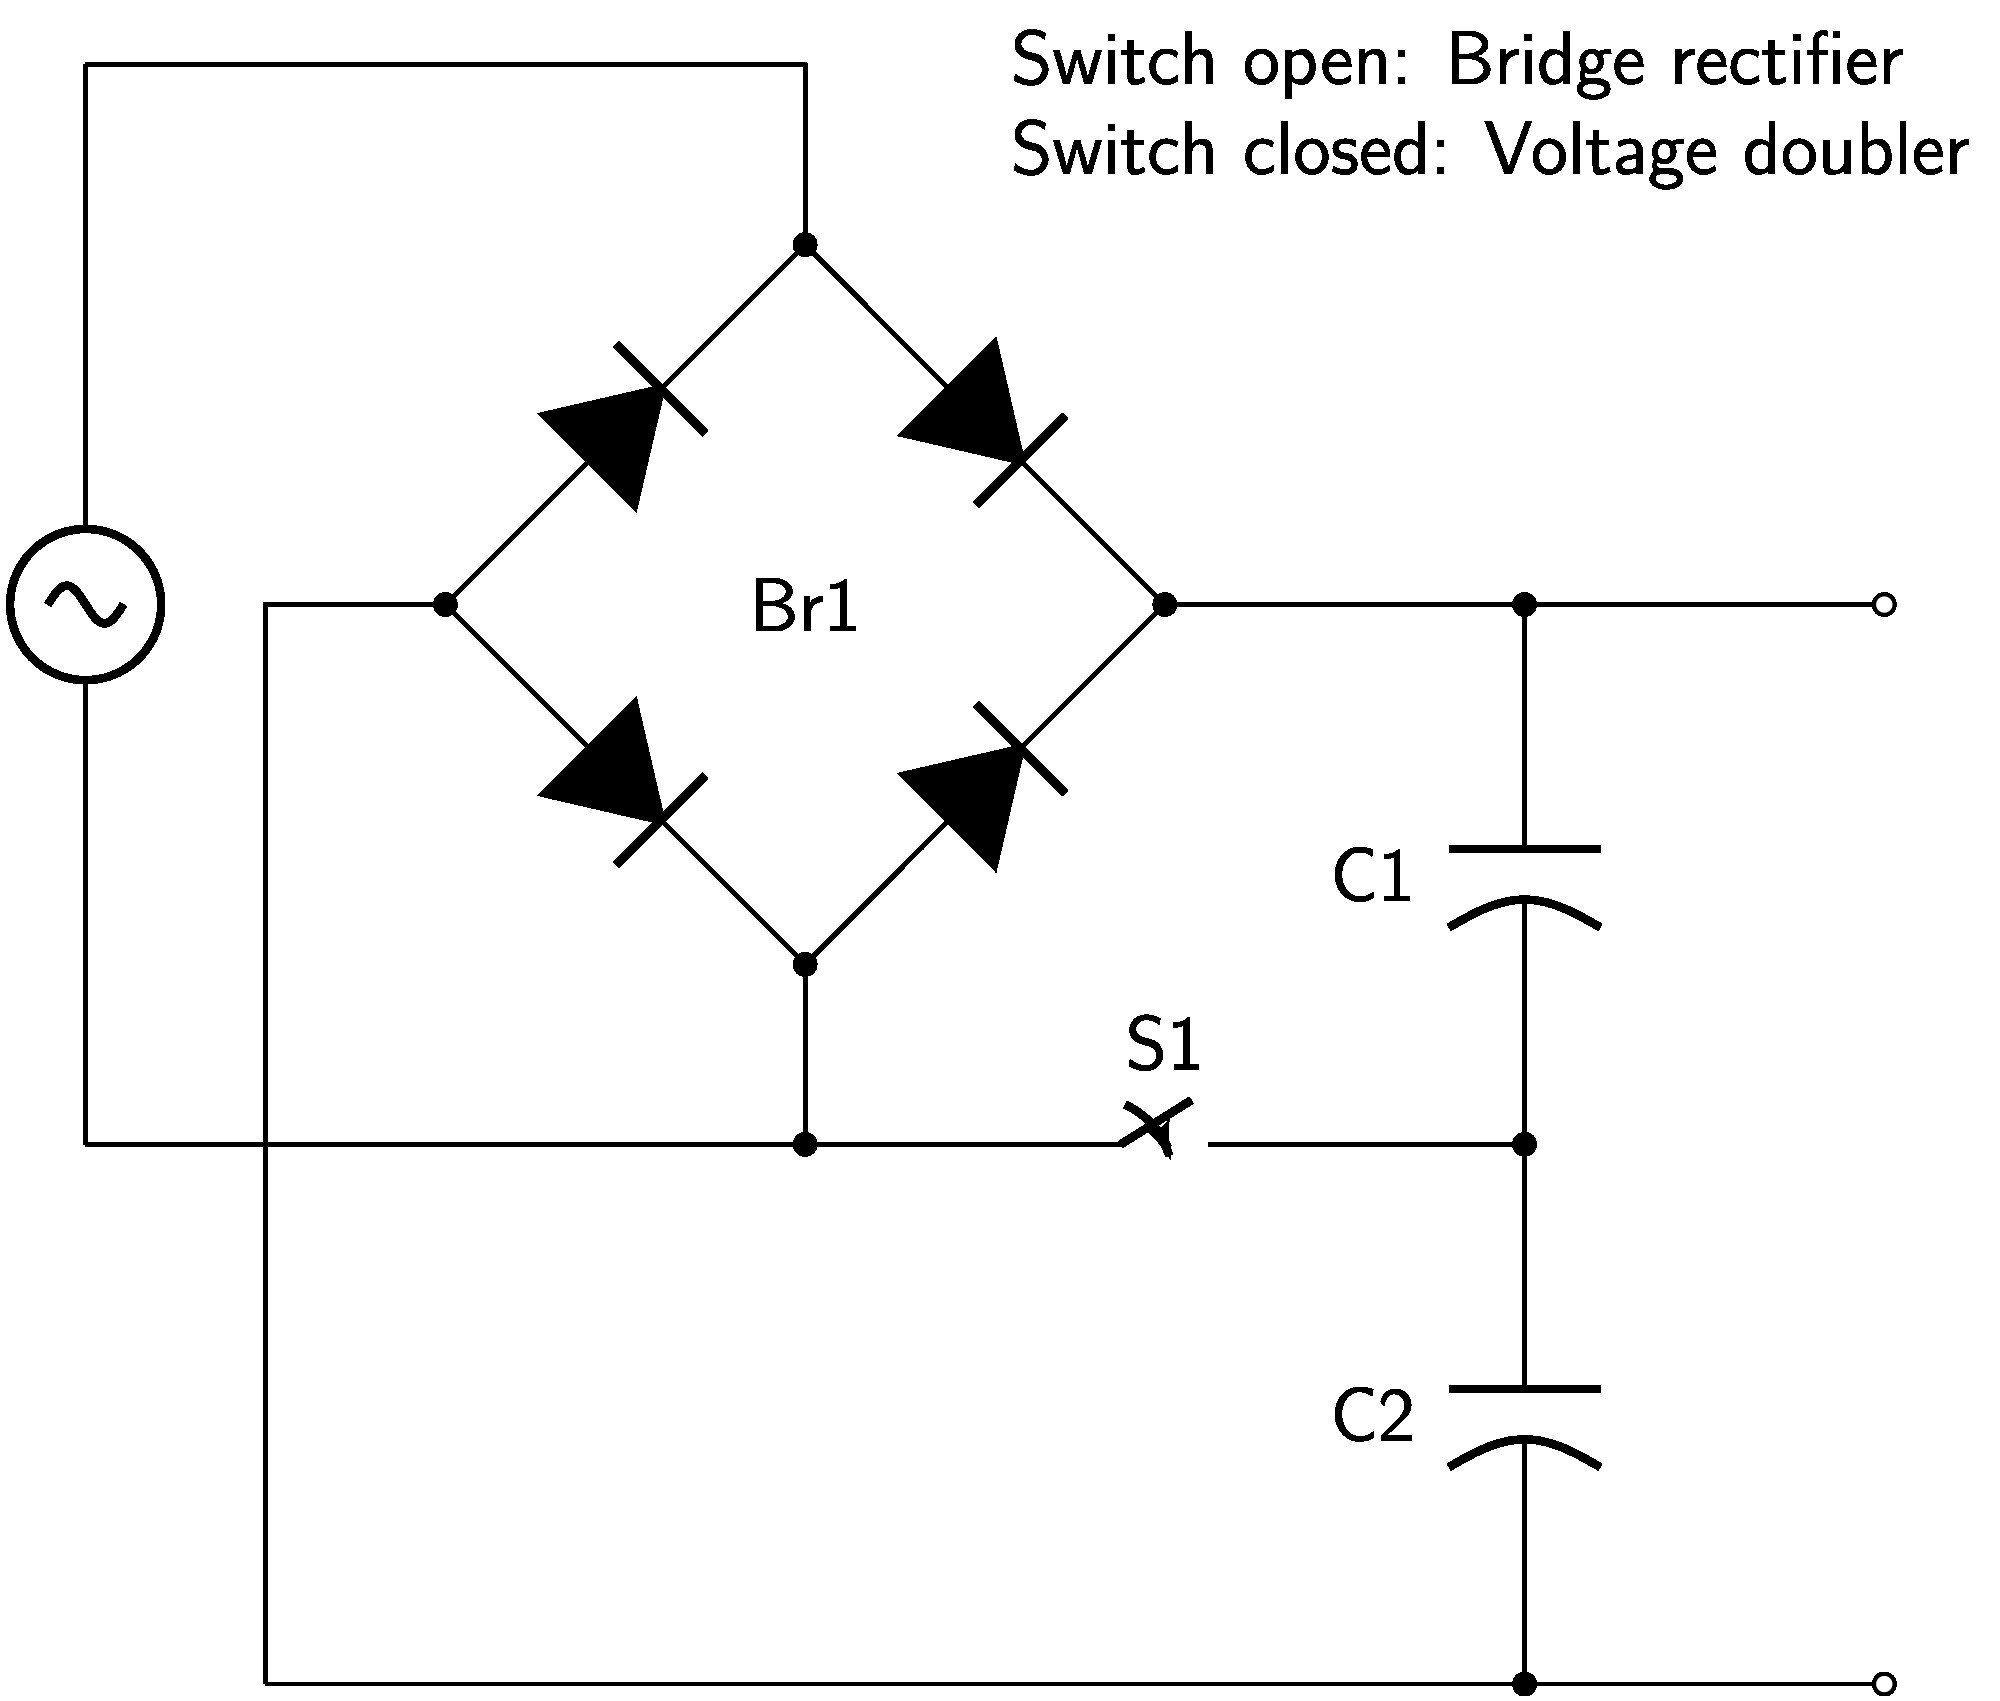 Wiring Diagram Bridge Third Level Dimarzio Yjm Way Rectifier Components Tube Unusual Kbpc3510 Briggs Vanguard Twin Cylinder